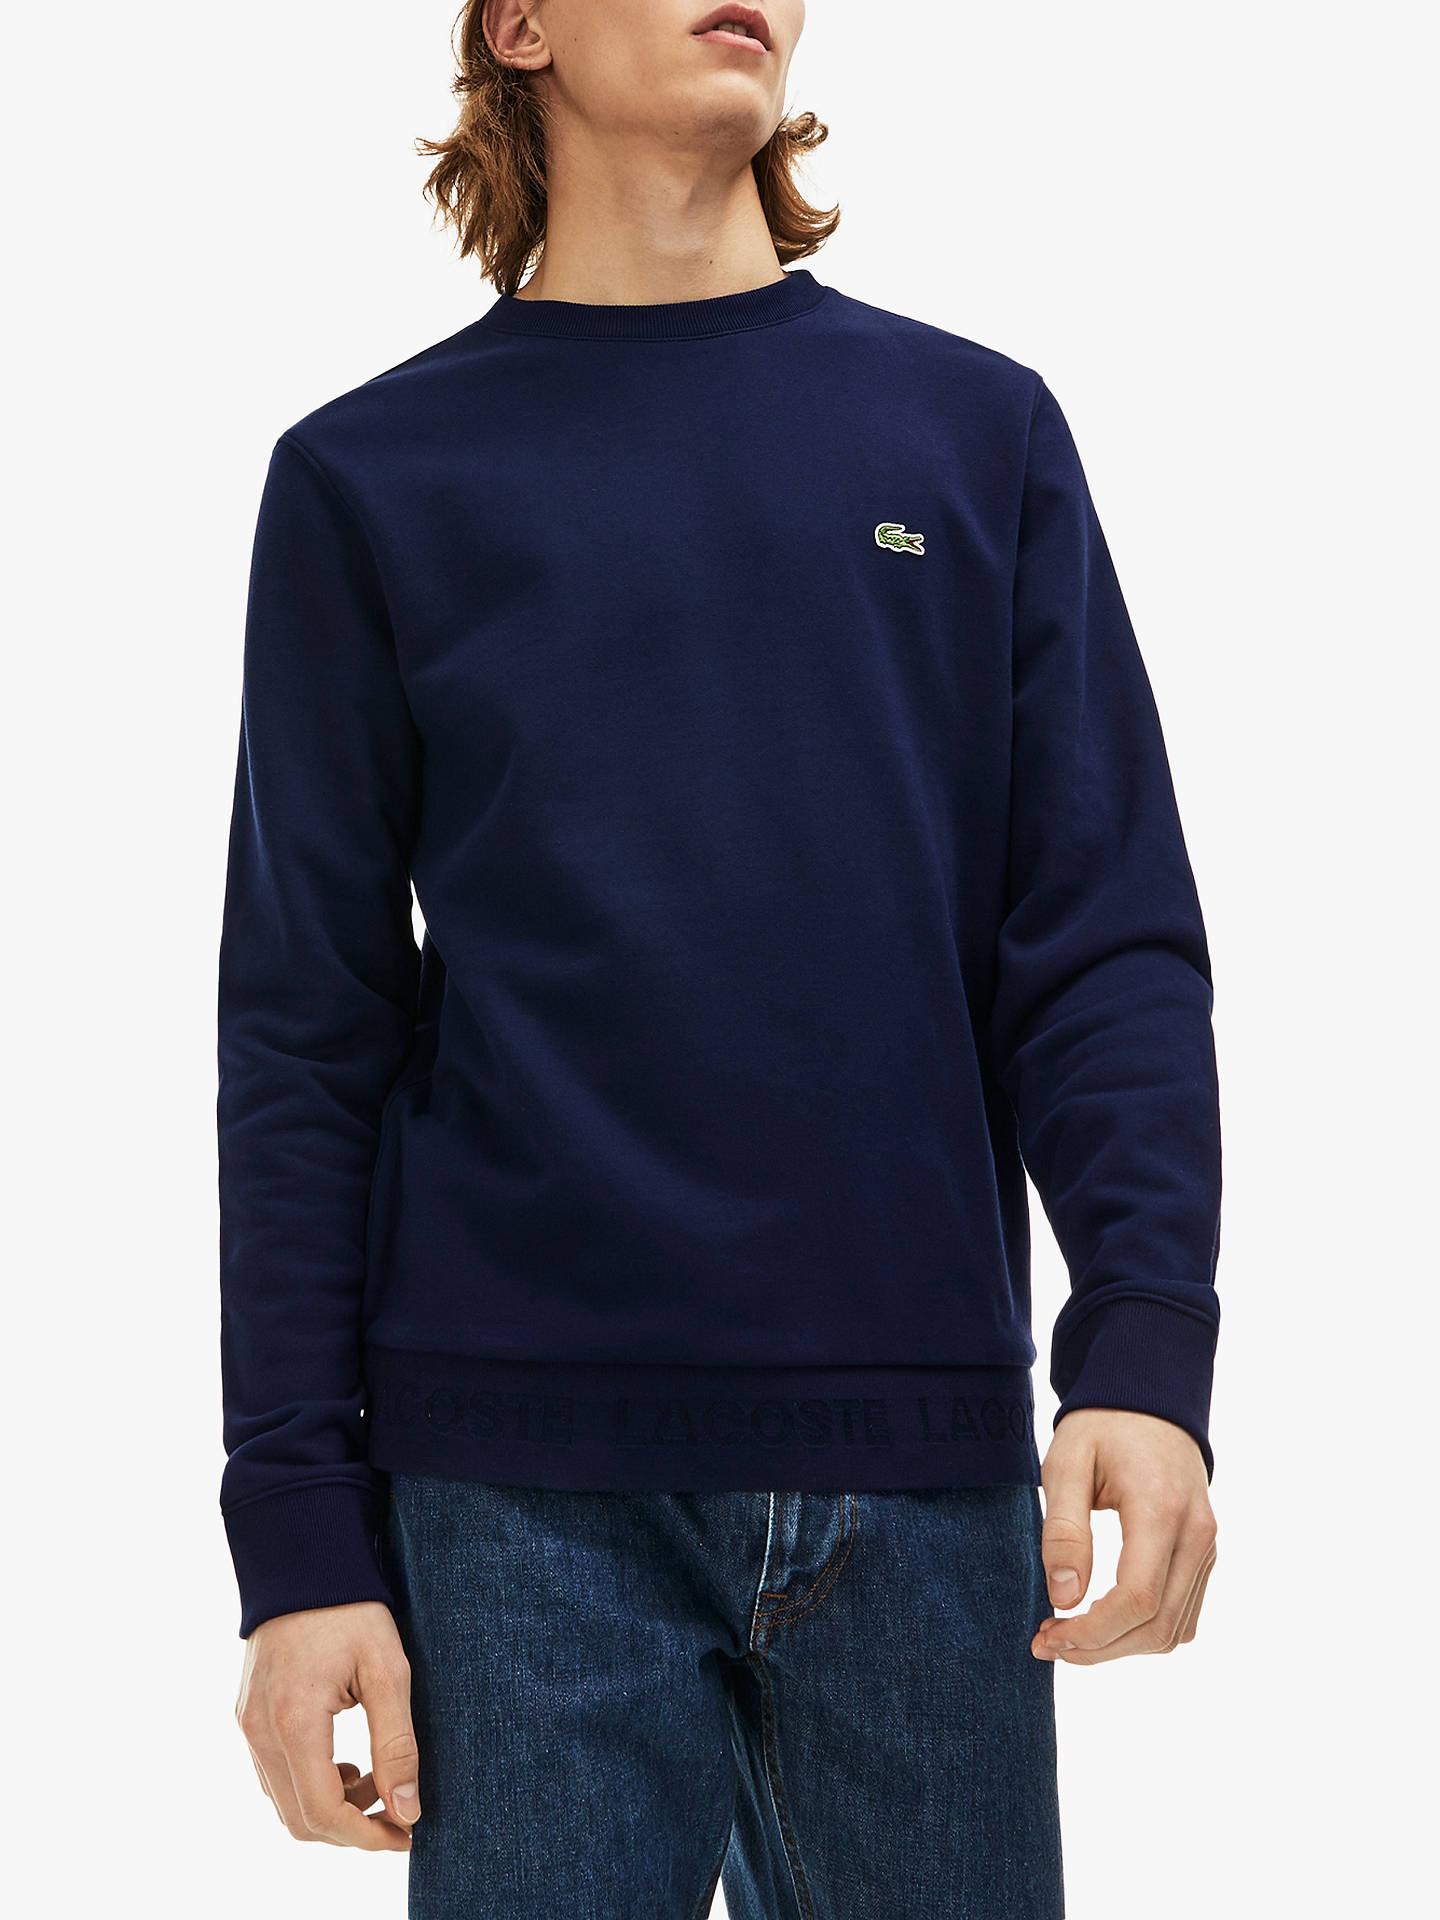 568a99a4 Lacoste Crew Neck Sweatshirt, Navy at John Lewis & Partners